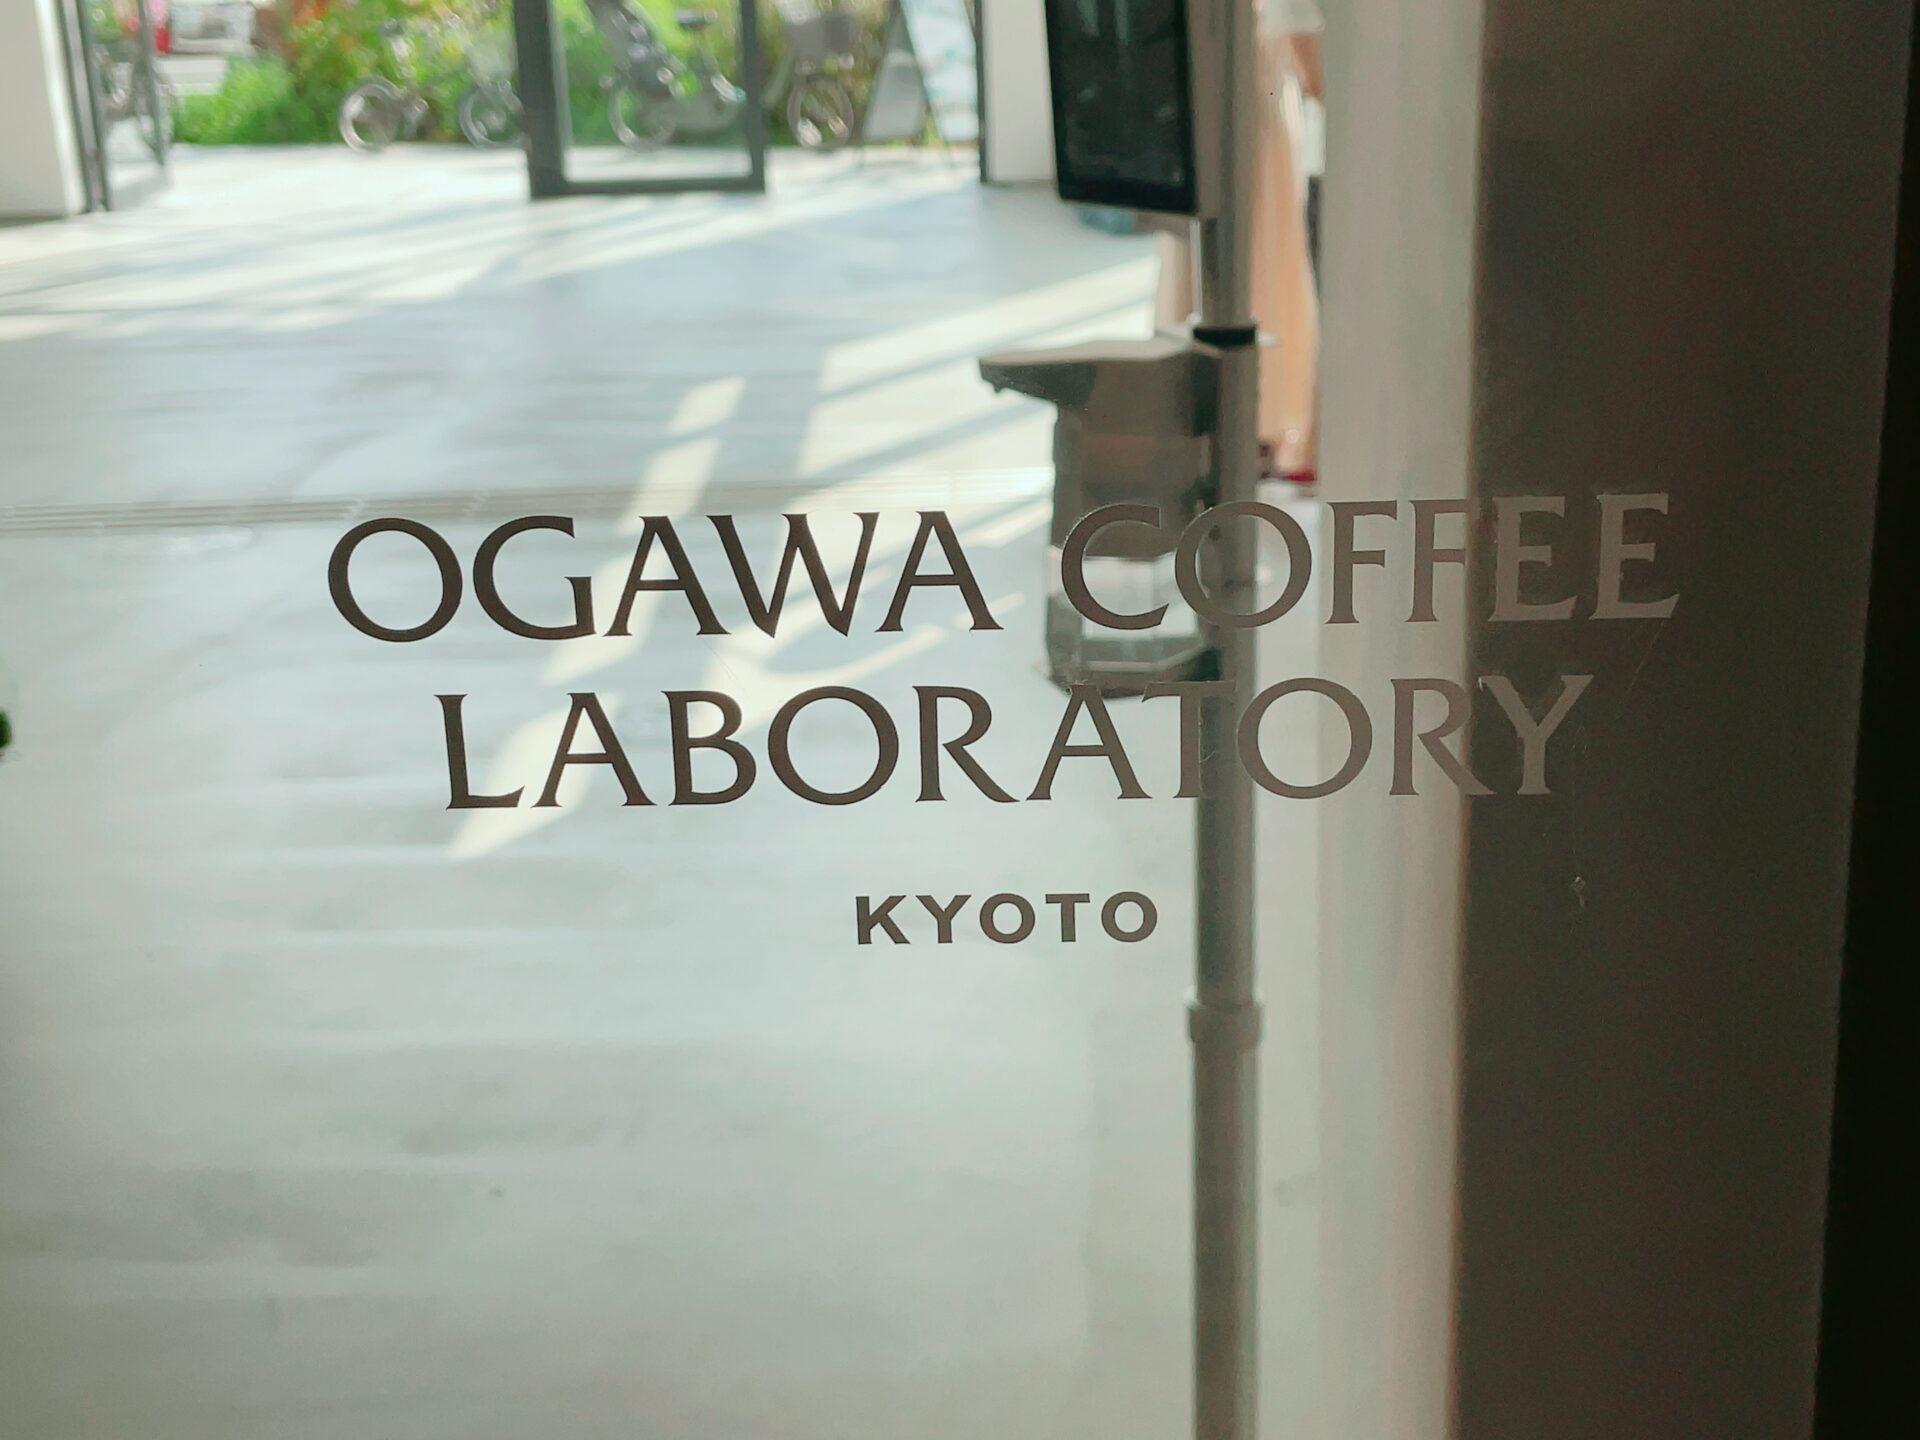 OGAWA COFFEE LABORATORY 下北沢店のロゴ